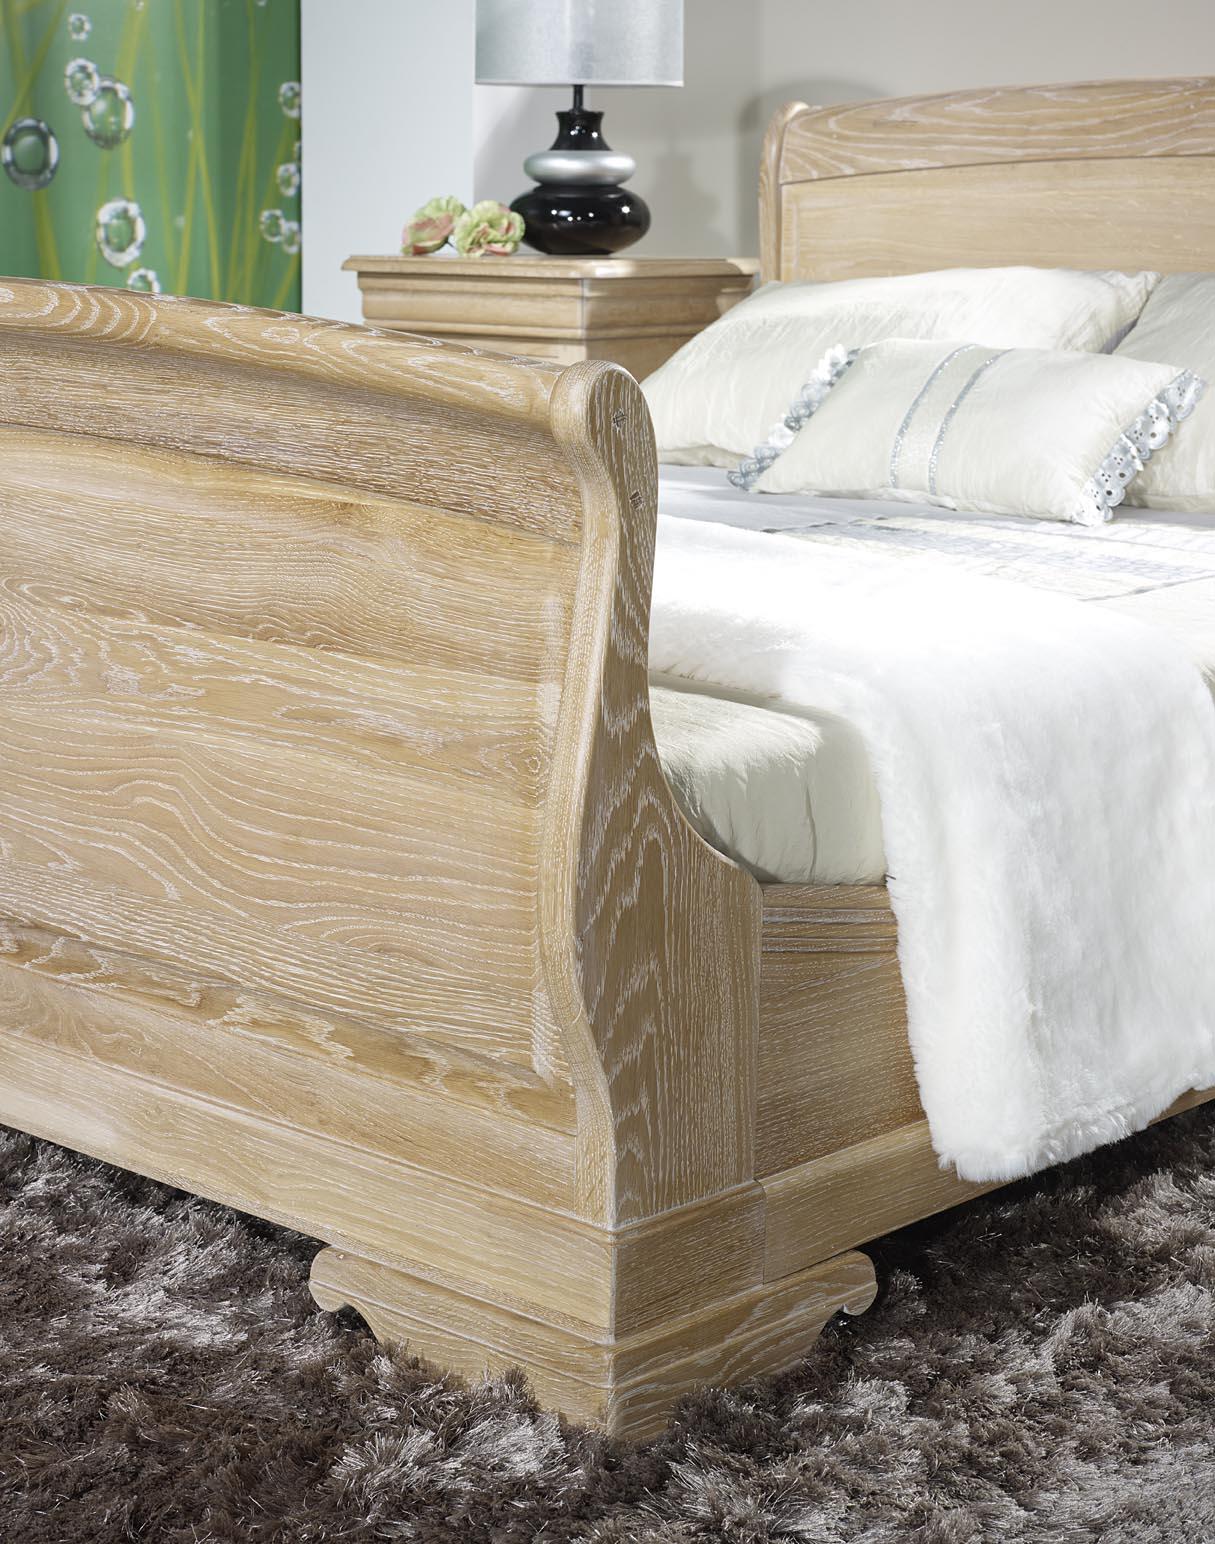 lit hugo 160x200 en ch ne massif de style louis philippe. Black Bedroom Furniture Sets. Home Design Ideas